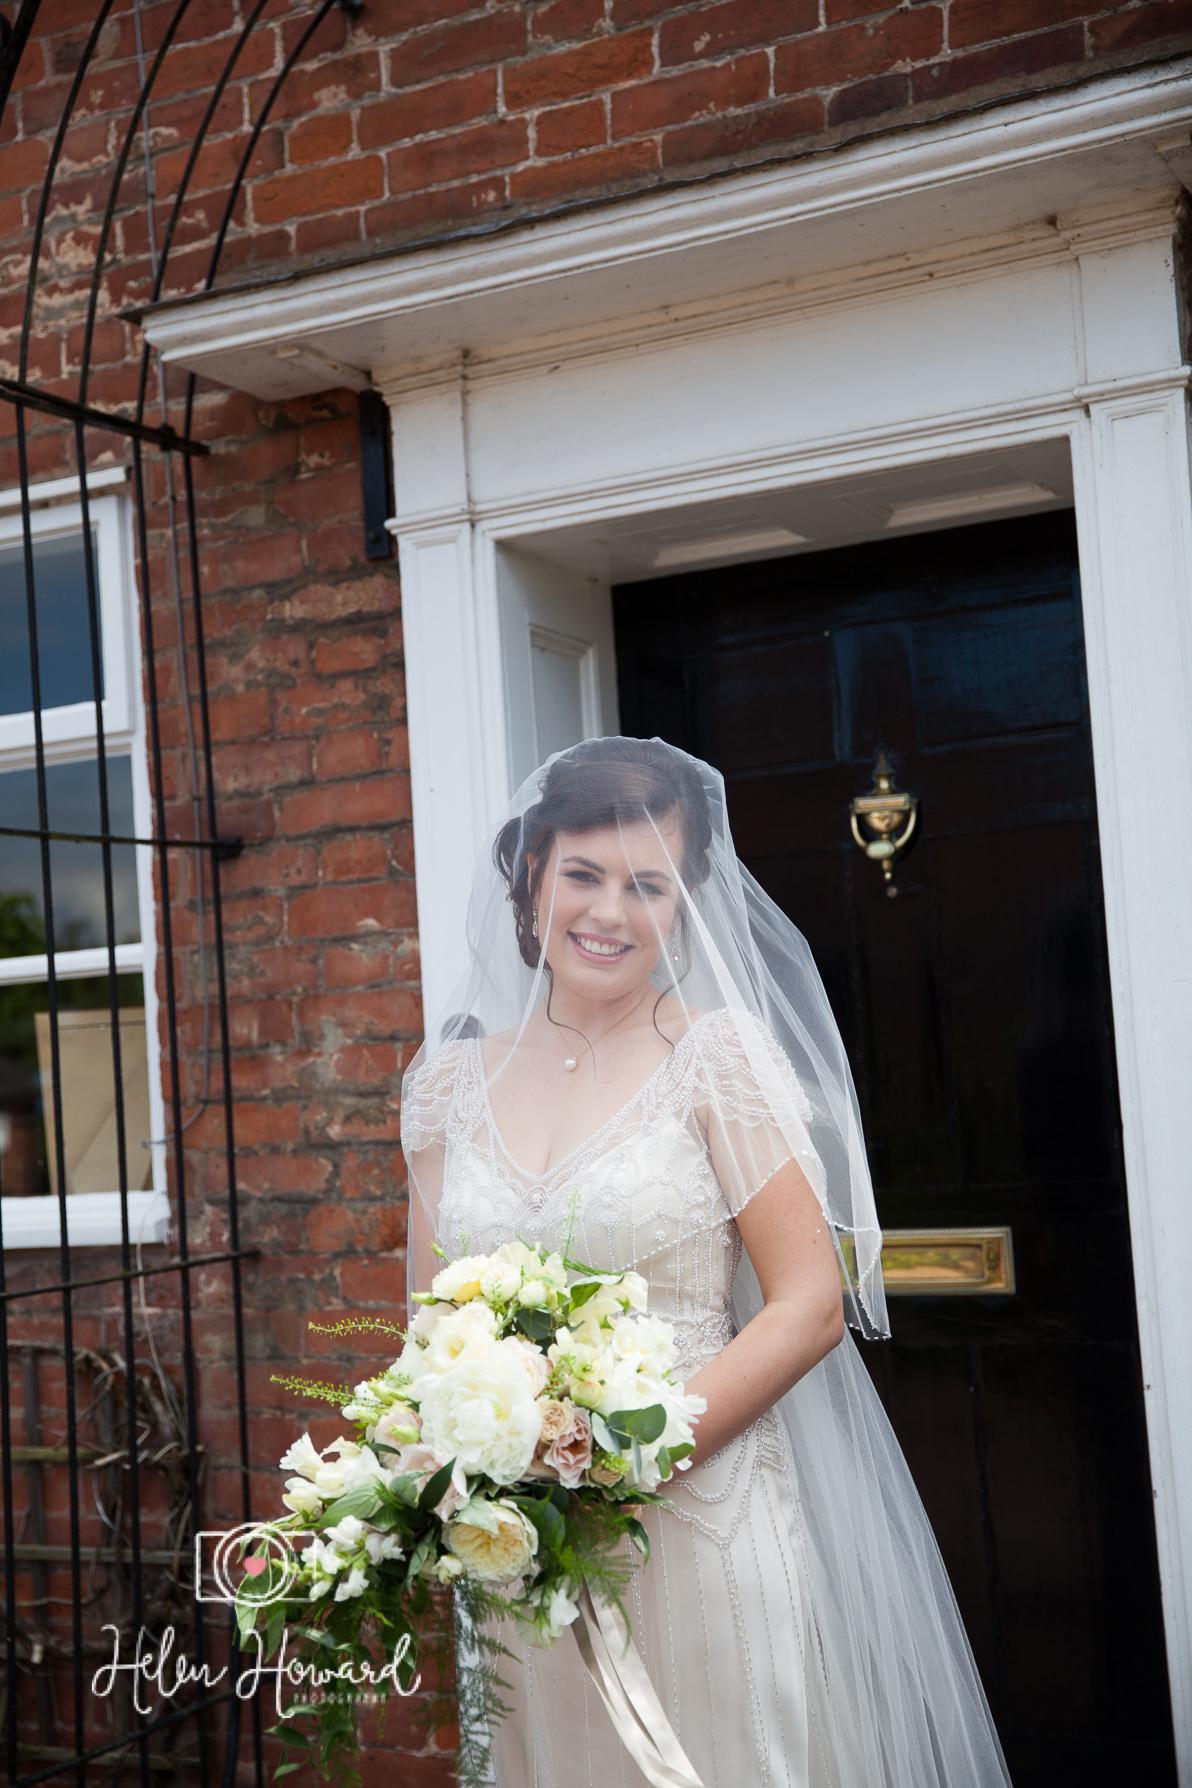 Helen Howard Photography Packington Moor Wedding-59.jpg